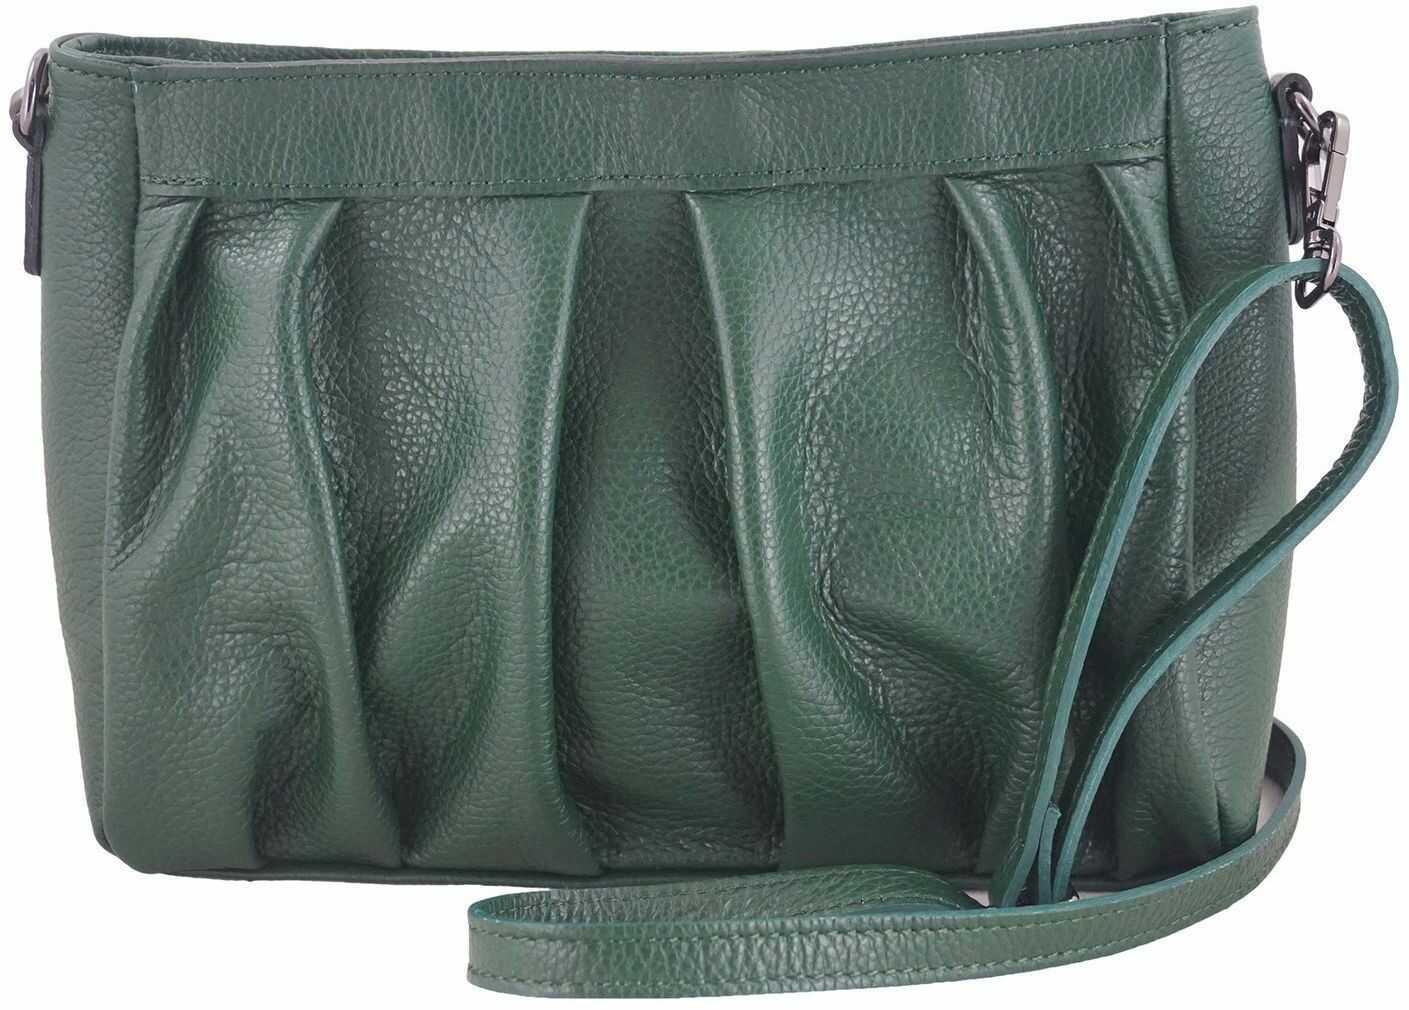 Modna marszczona torebka damska - Zielona ciemna